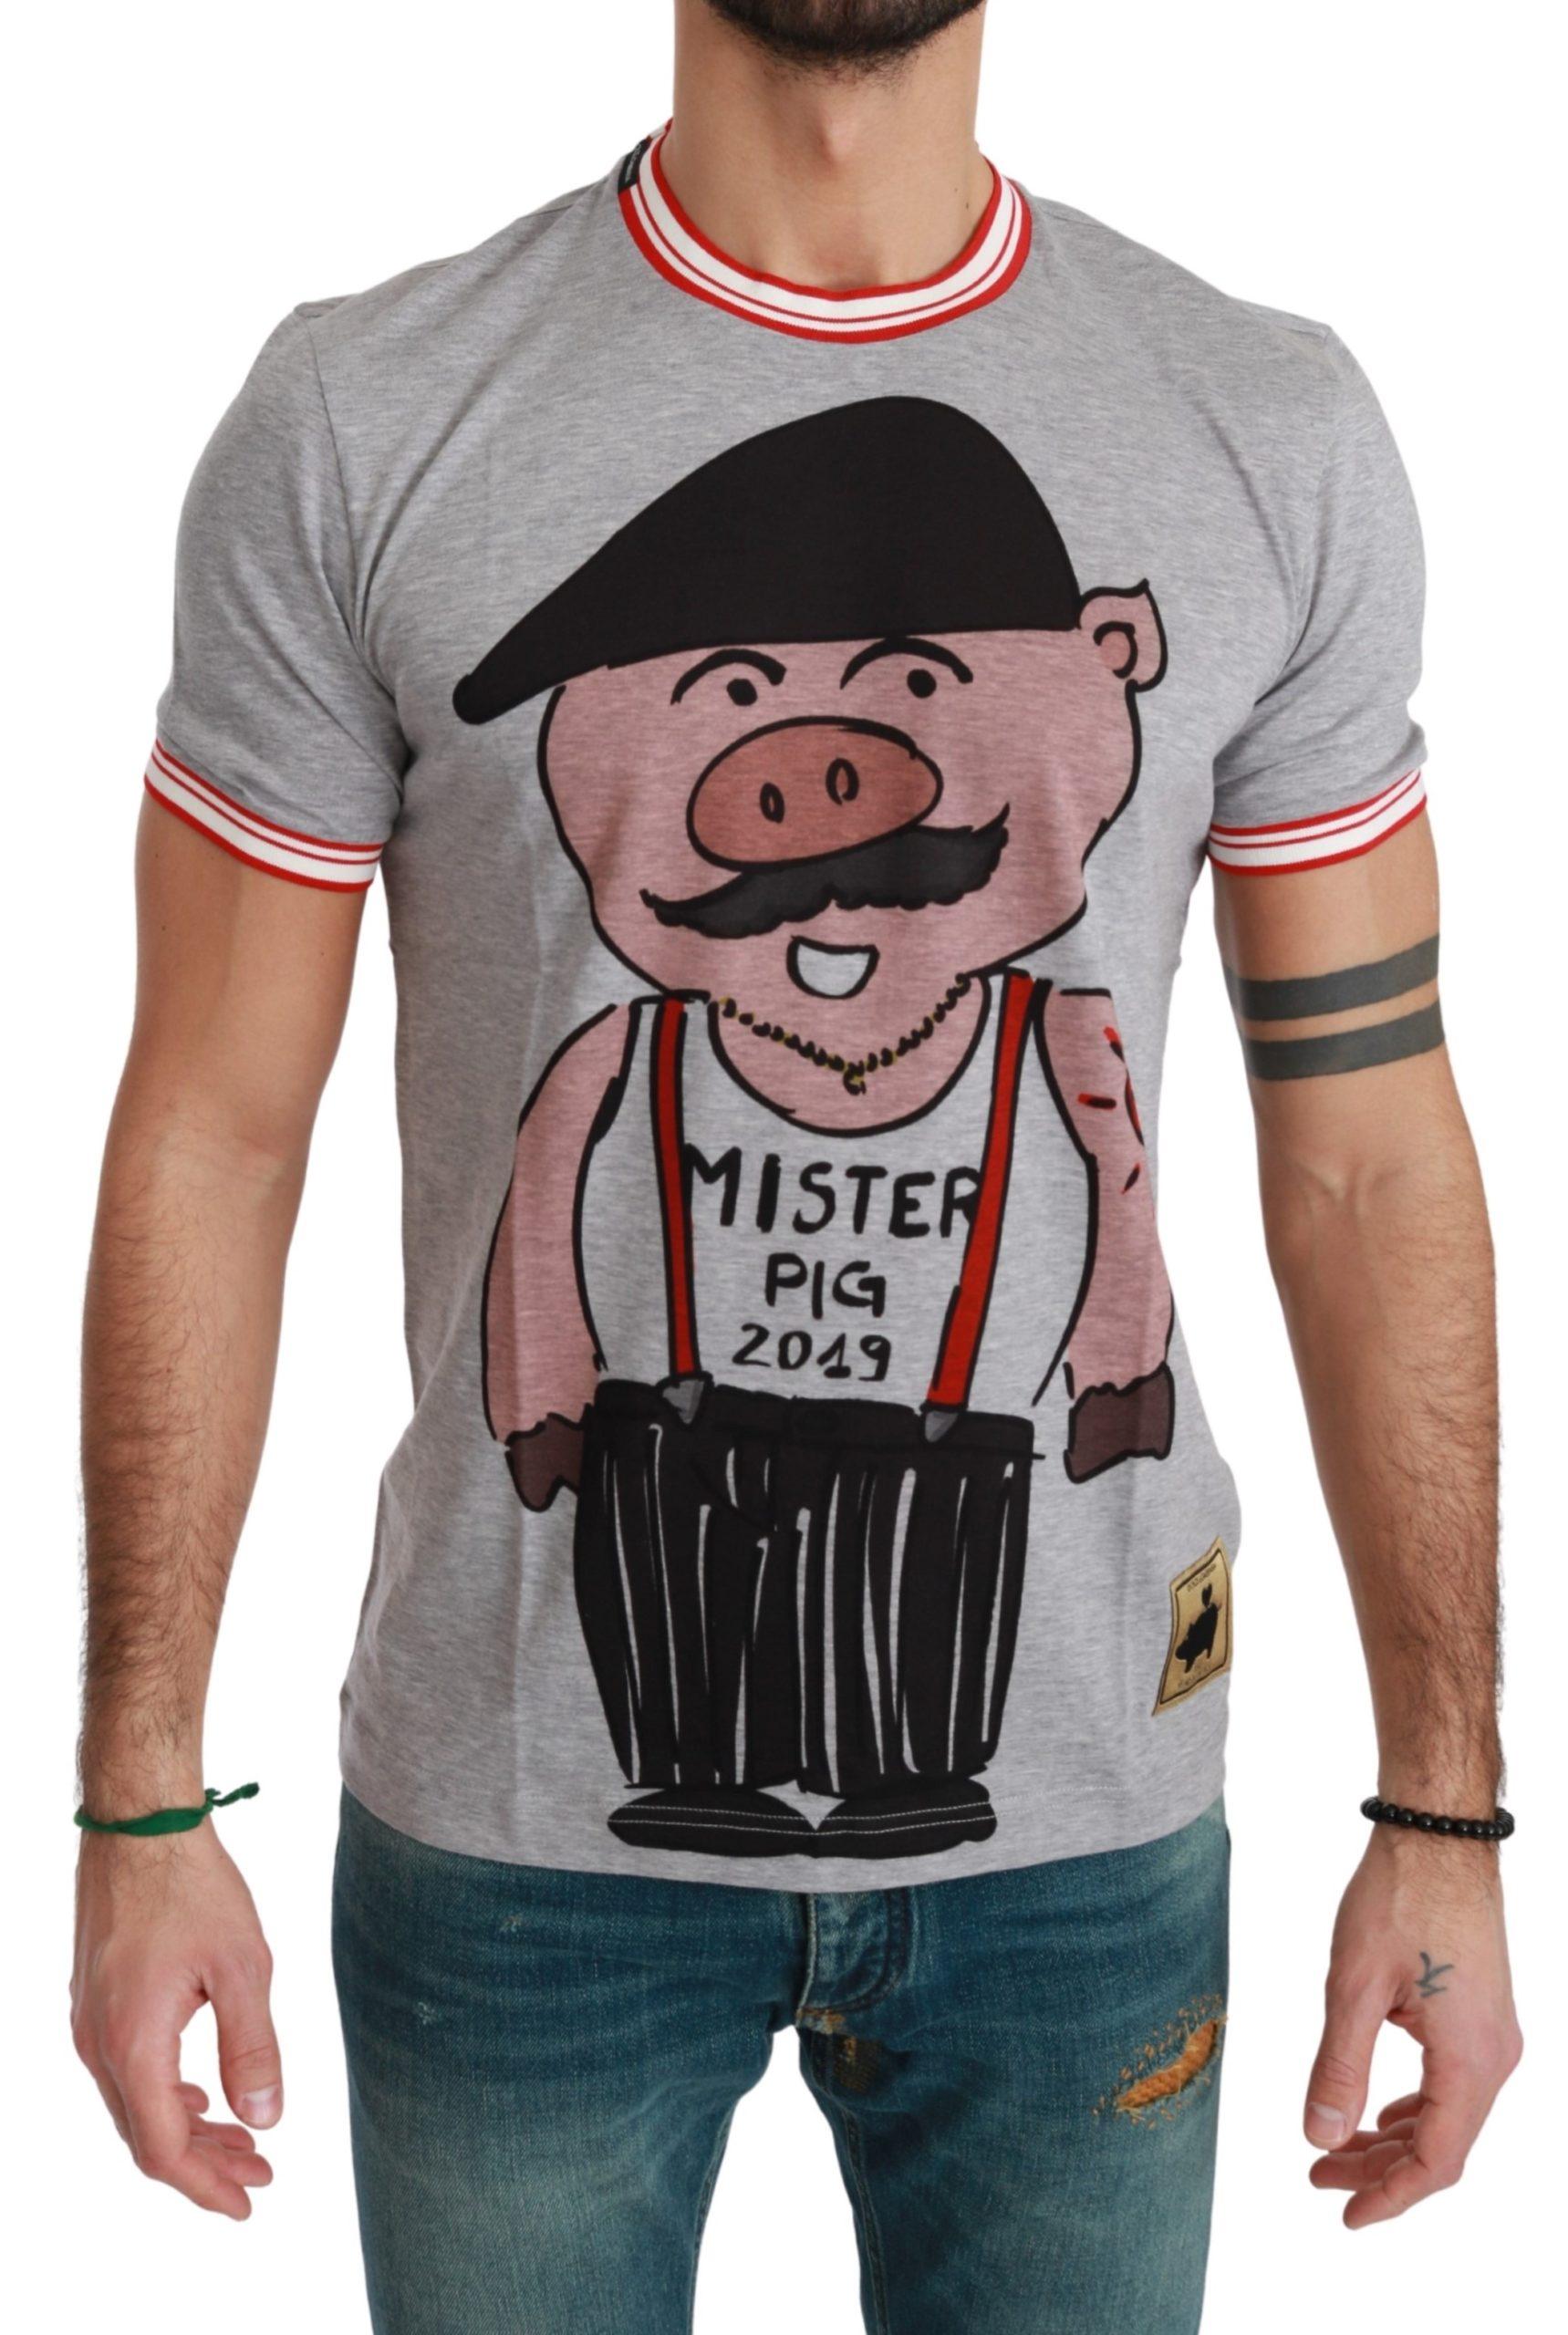 Dolce & Gabbana Men's Cotton the Pig T-Shirt Gray TSH4557 - IT44 | XS